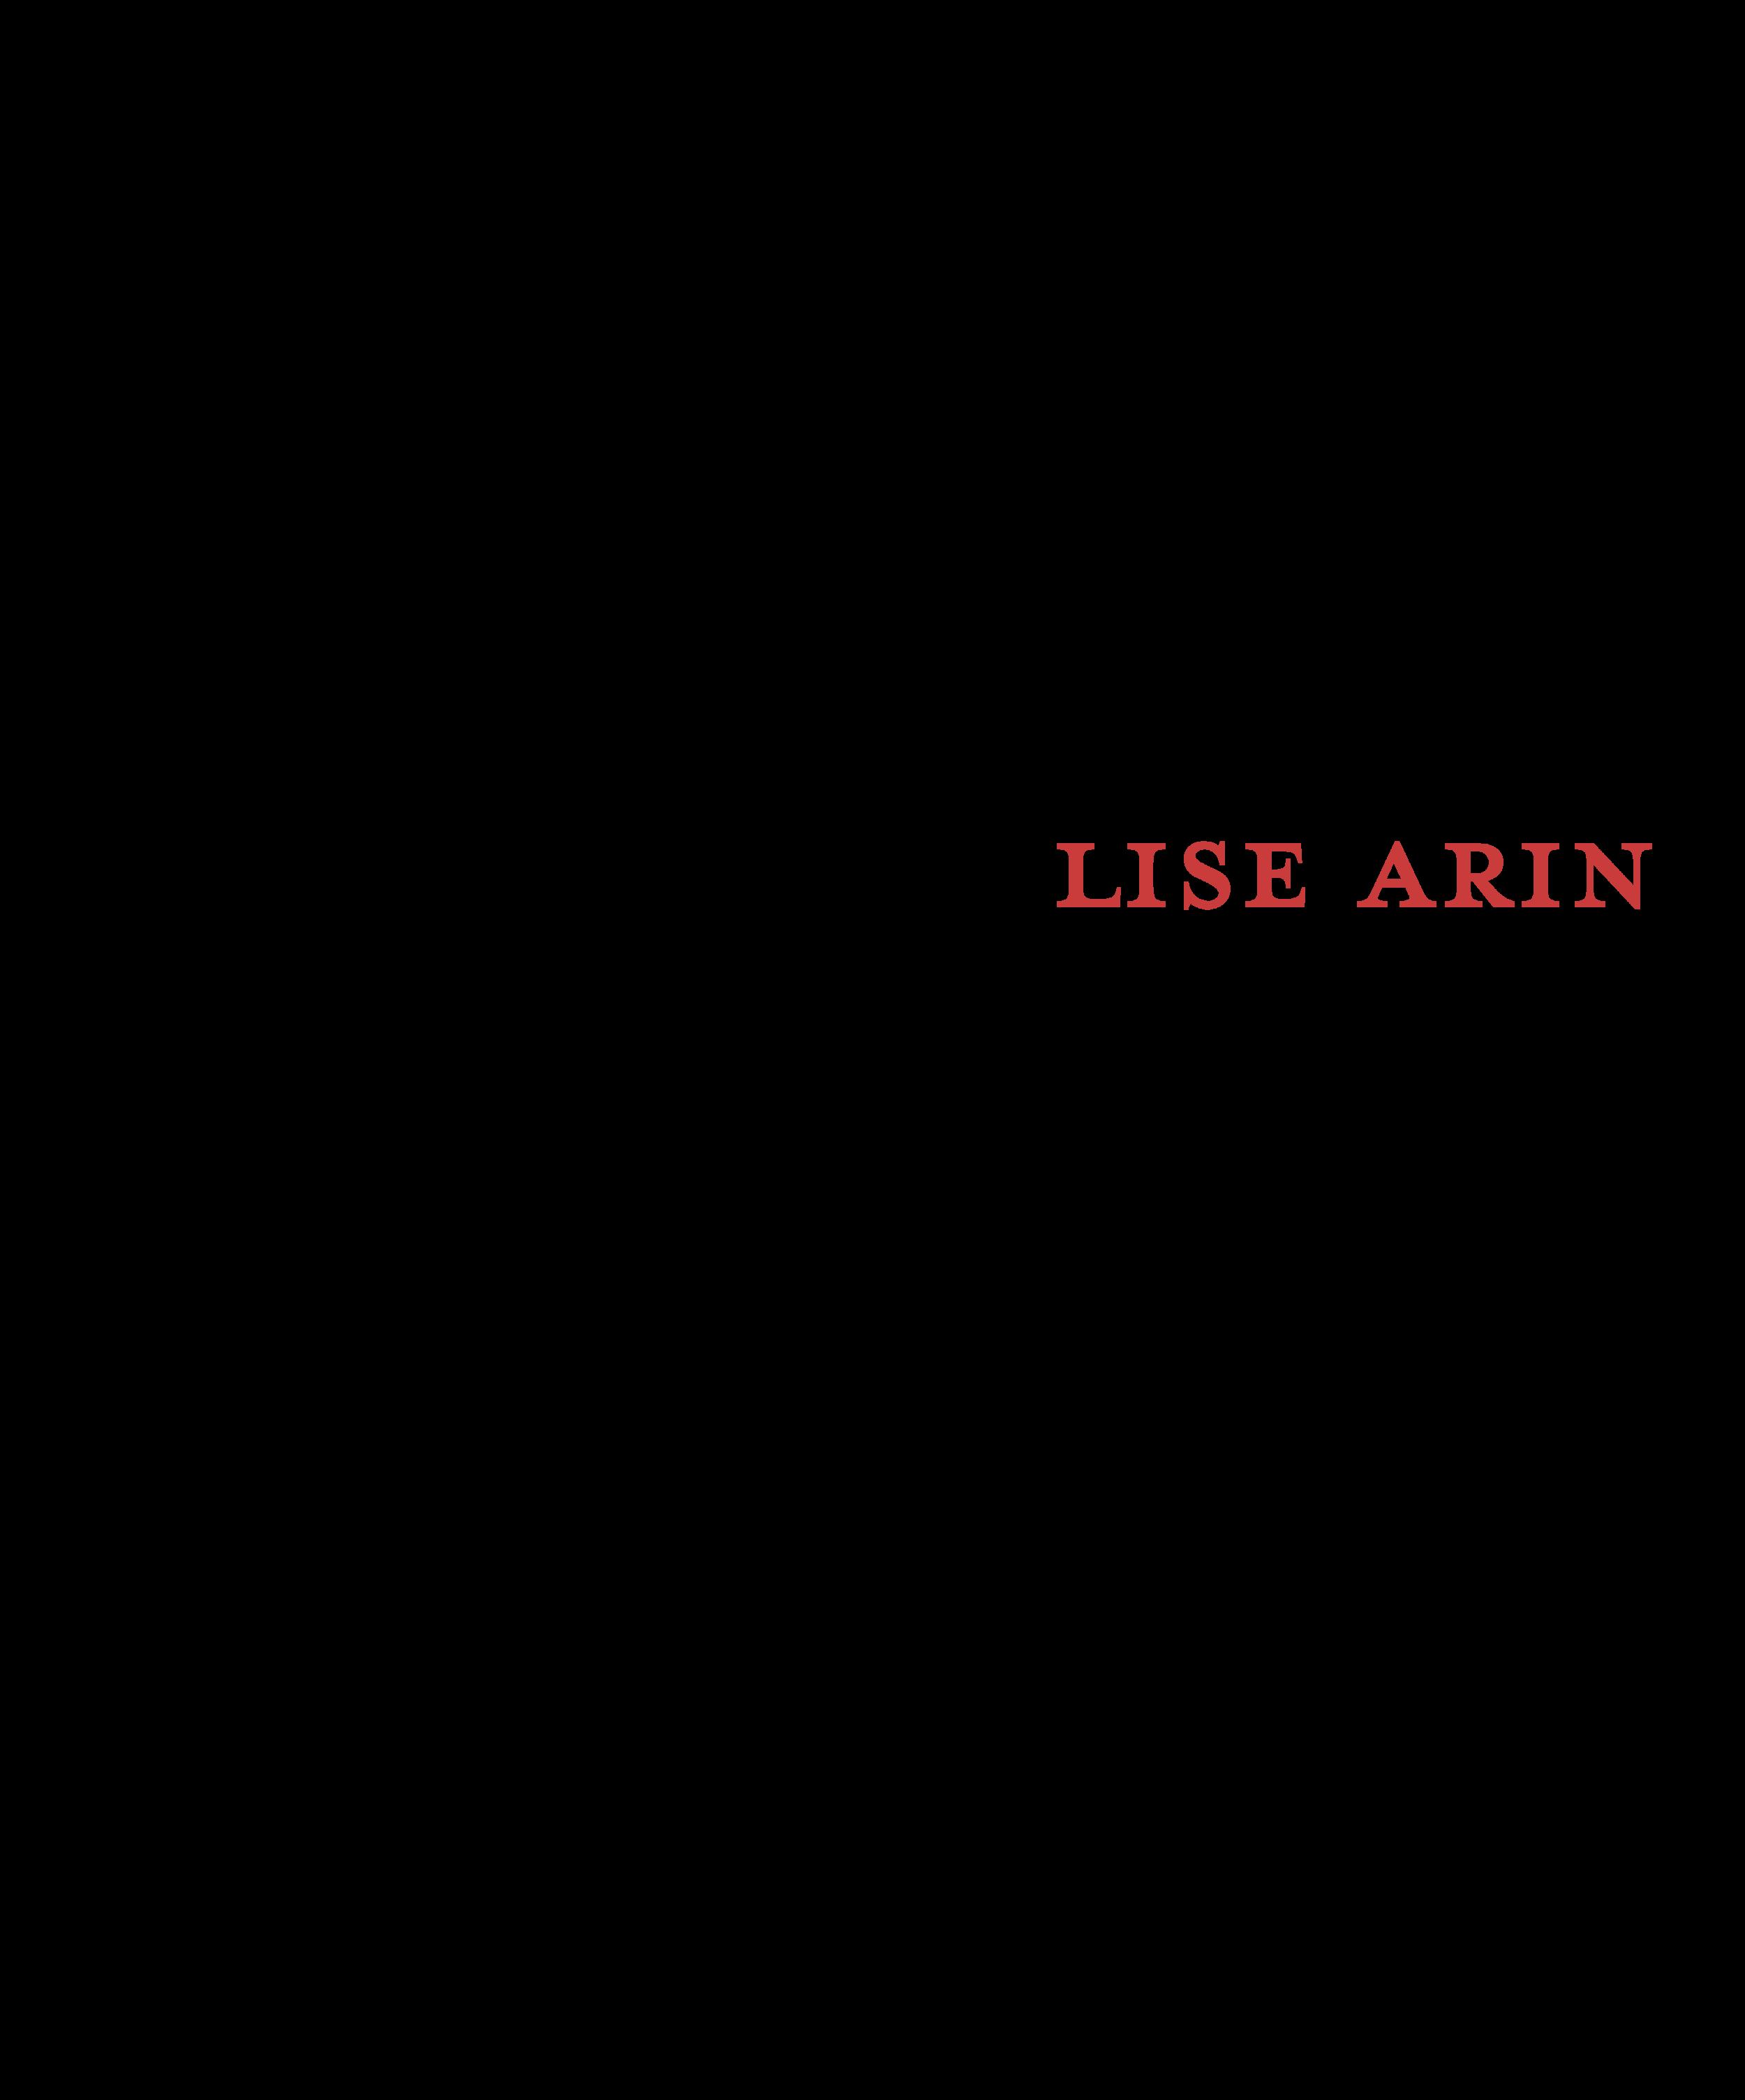 Lise Arin Logo Silhouettes_FINAL_LOGO.png